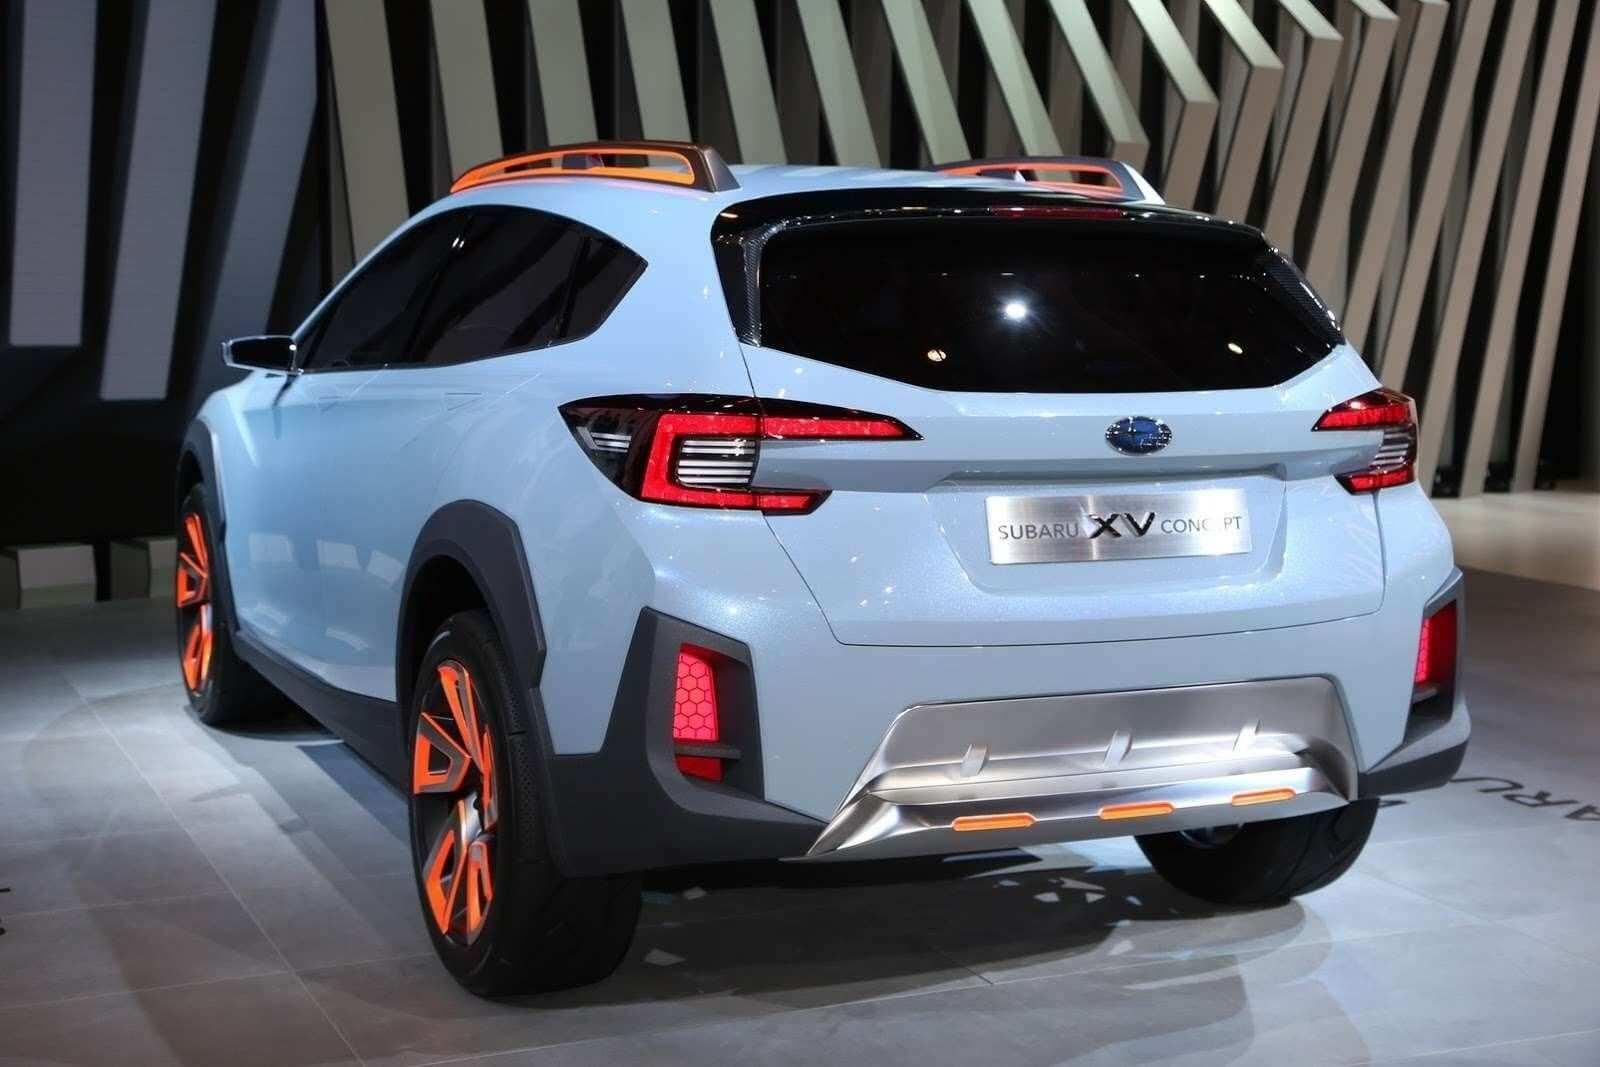 95 All New 2020 Subaru Crosstrek Hybridand Pricing for 2020 Subaru Crosstrek Hybridand